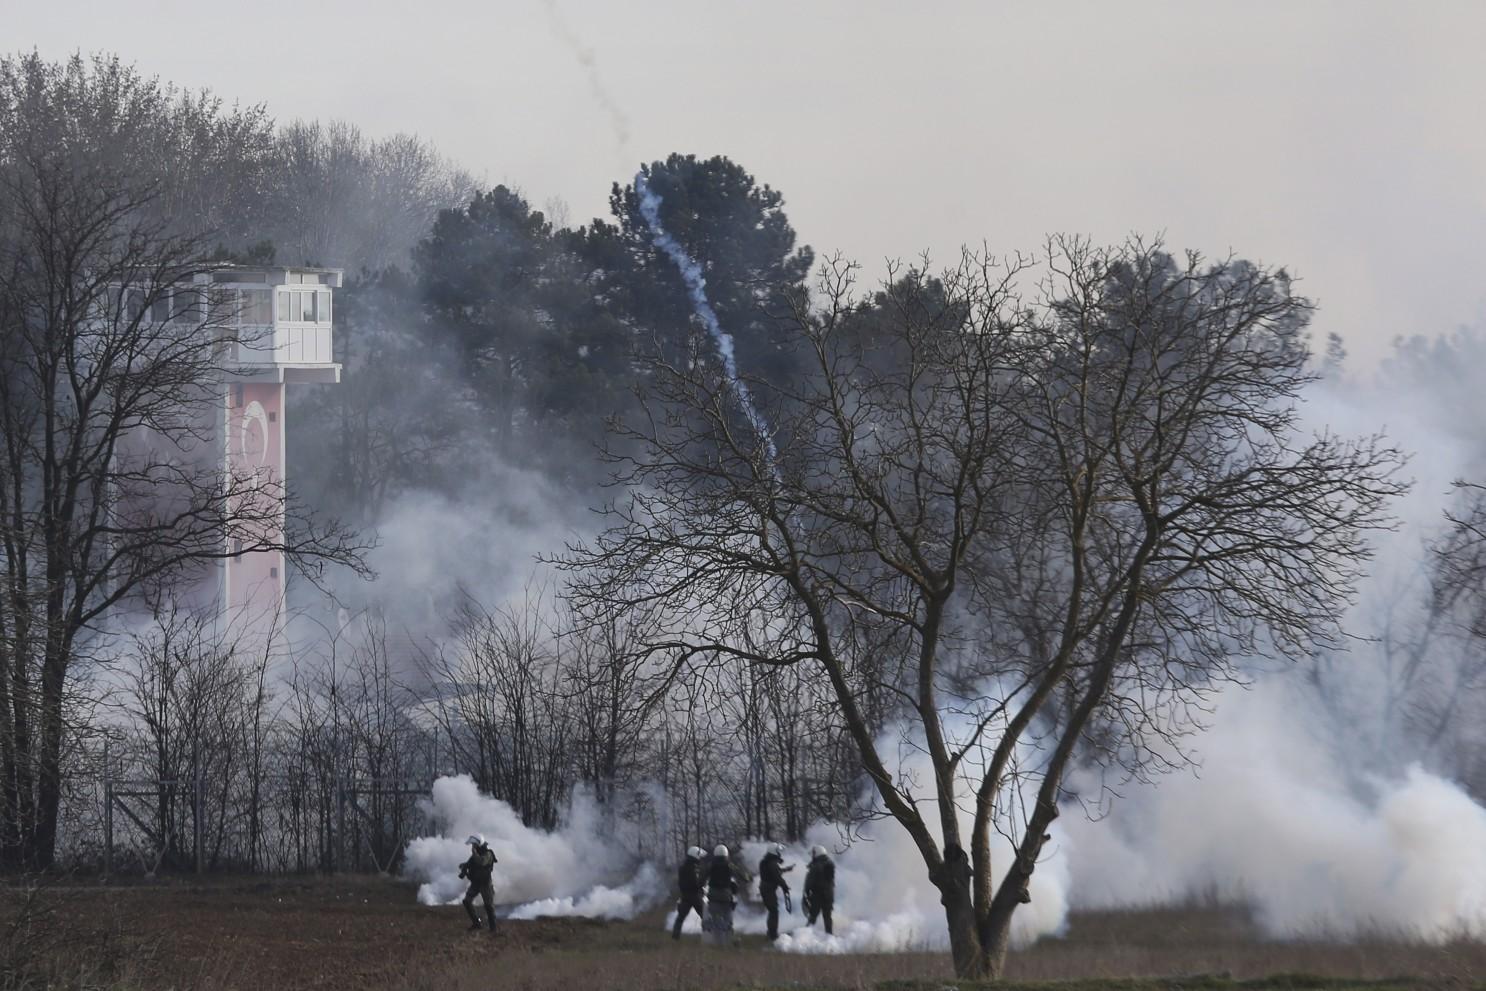 Photo of Οι βρώμικες τακτικές της τουρκικής αστυνομίας για να πέσει ο φράκτης στον Έβρο